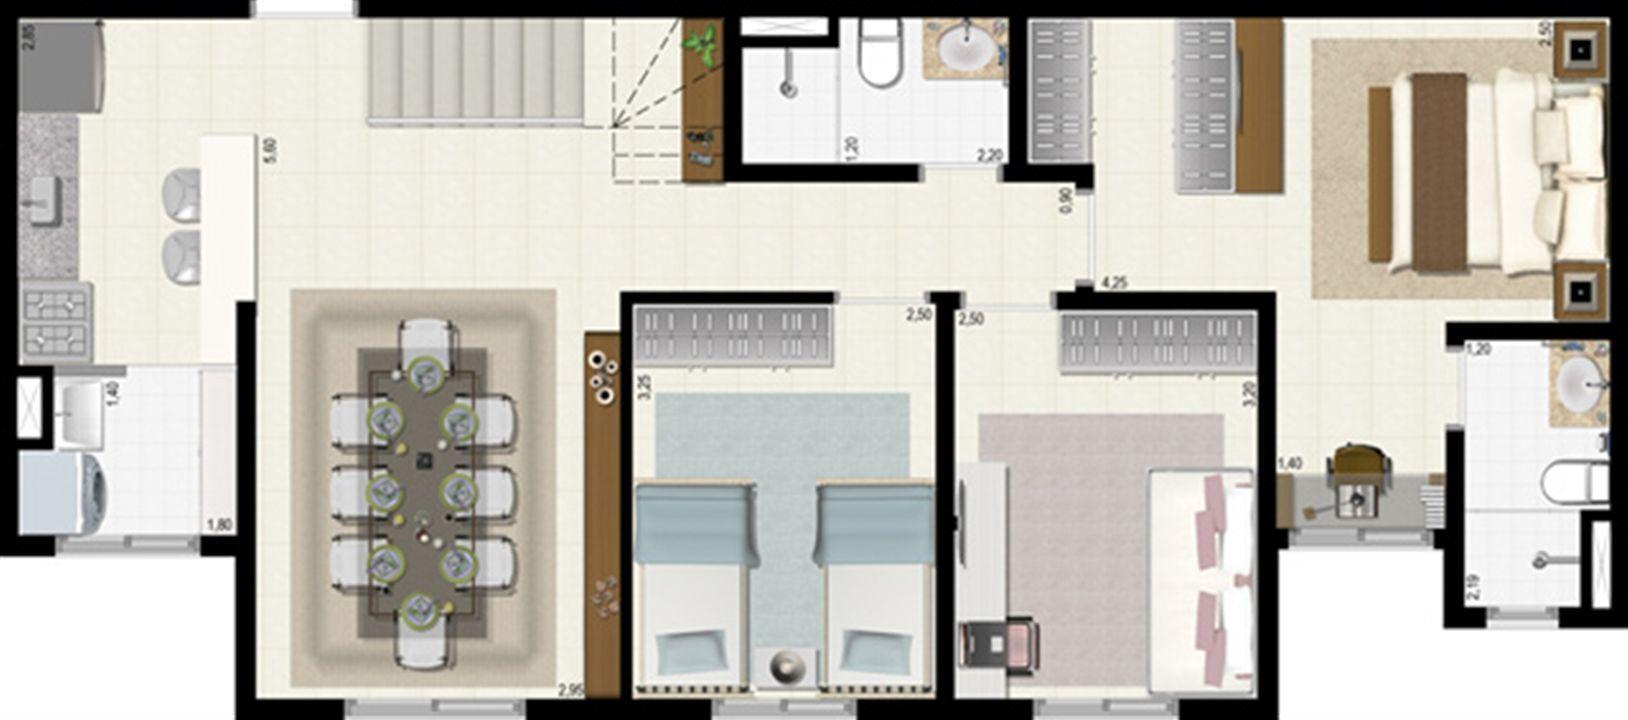 Planta duplex 126 m² - inferior | L´Acqua Condominium Club – Apartamentoem  Neópolis - Natal - Rio Grande do Norte